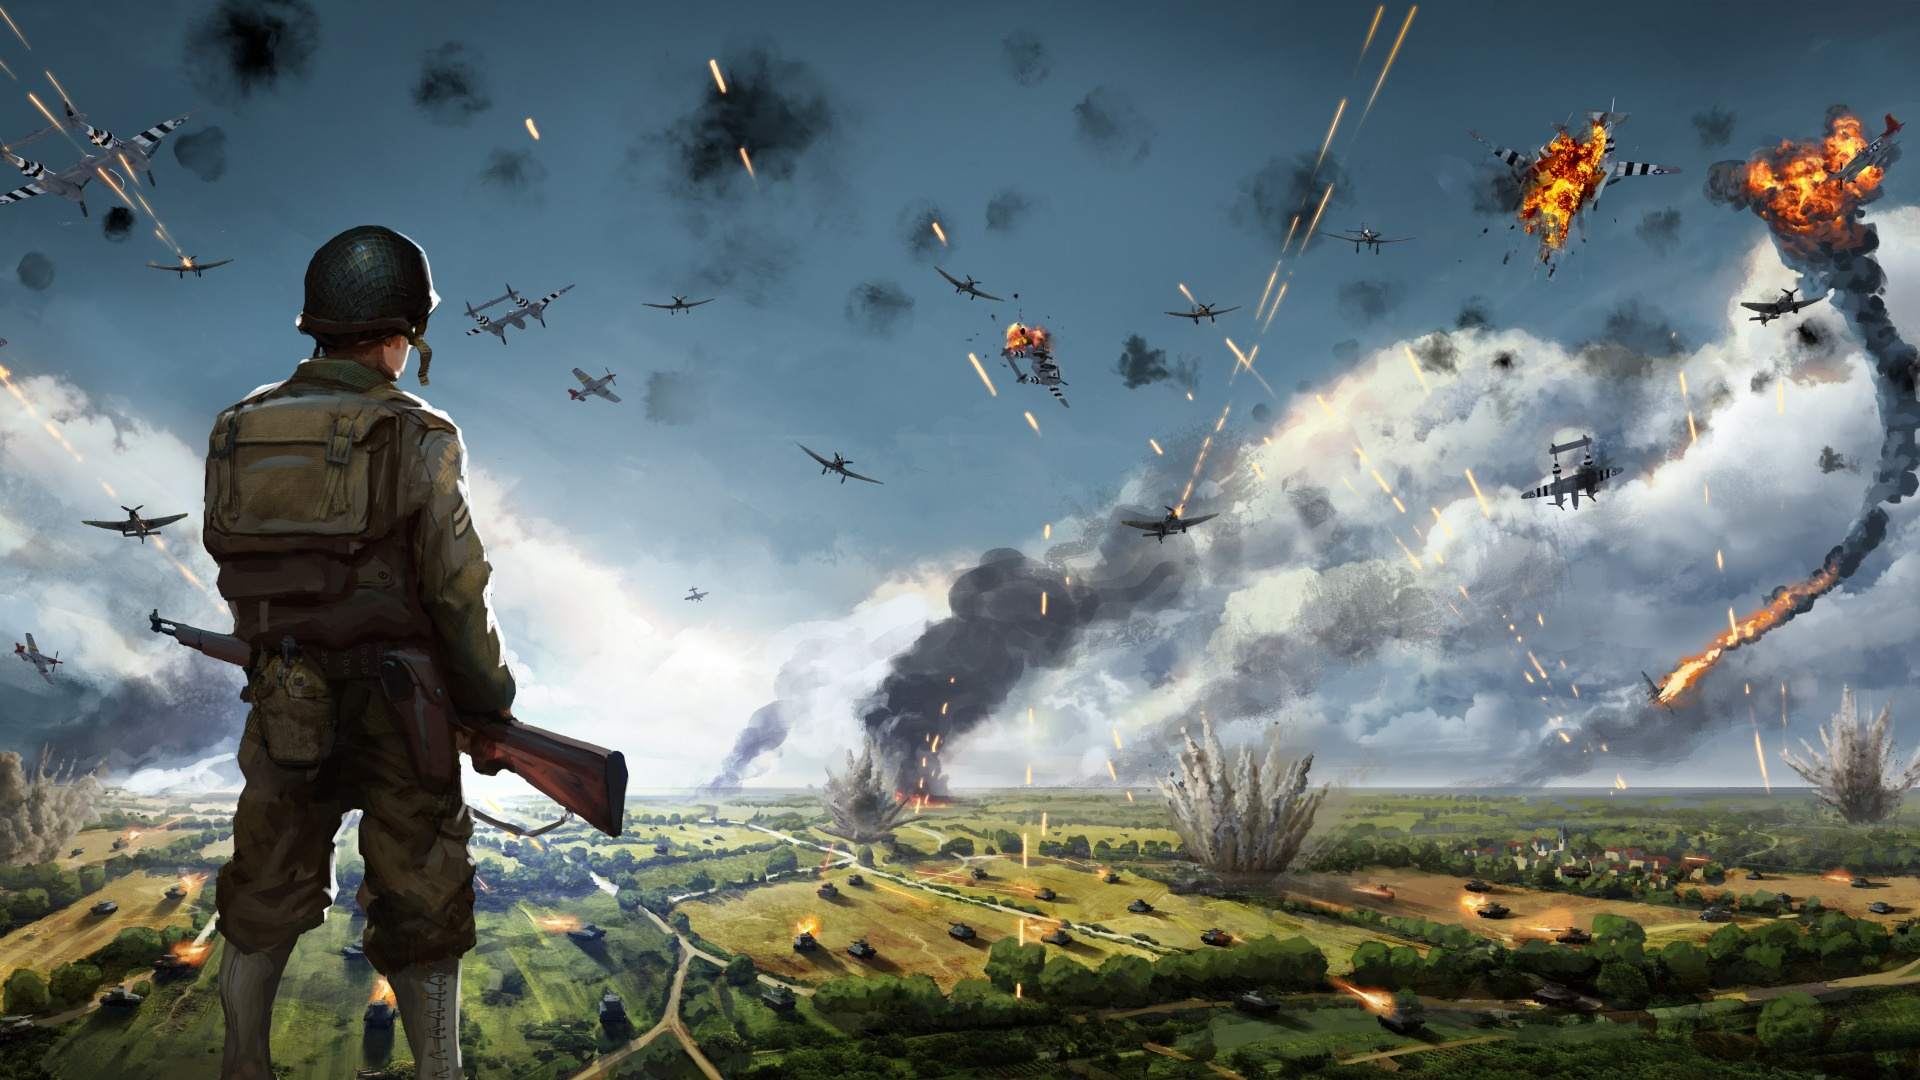 War Wallpaper Picture hd